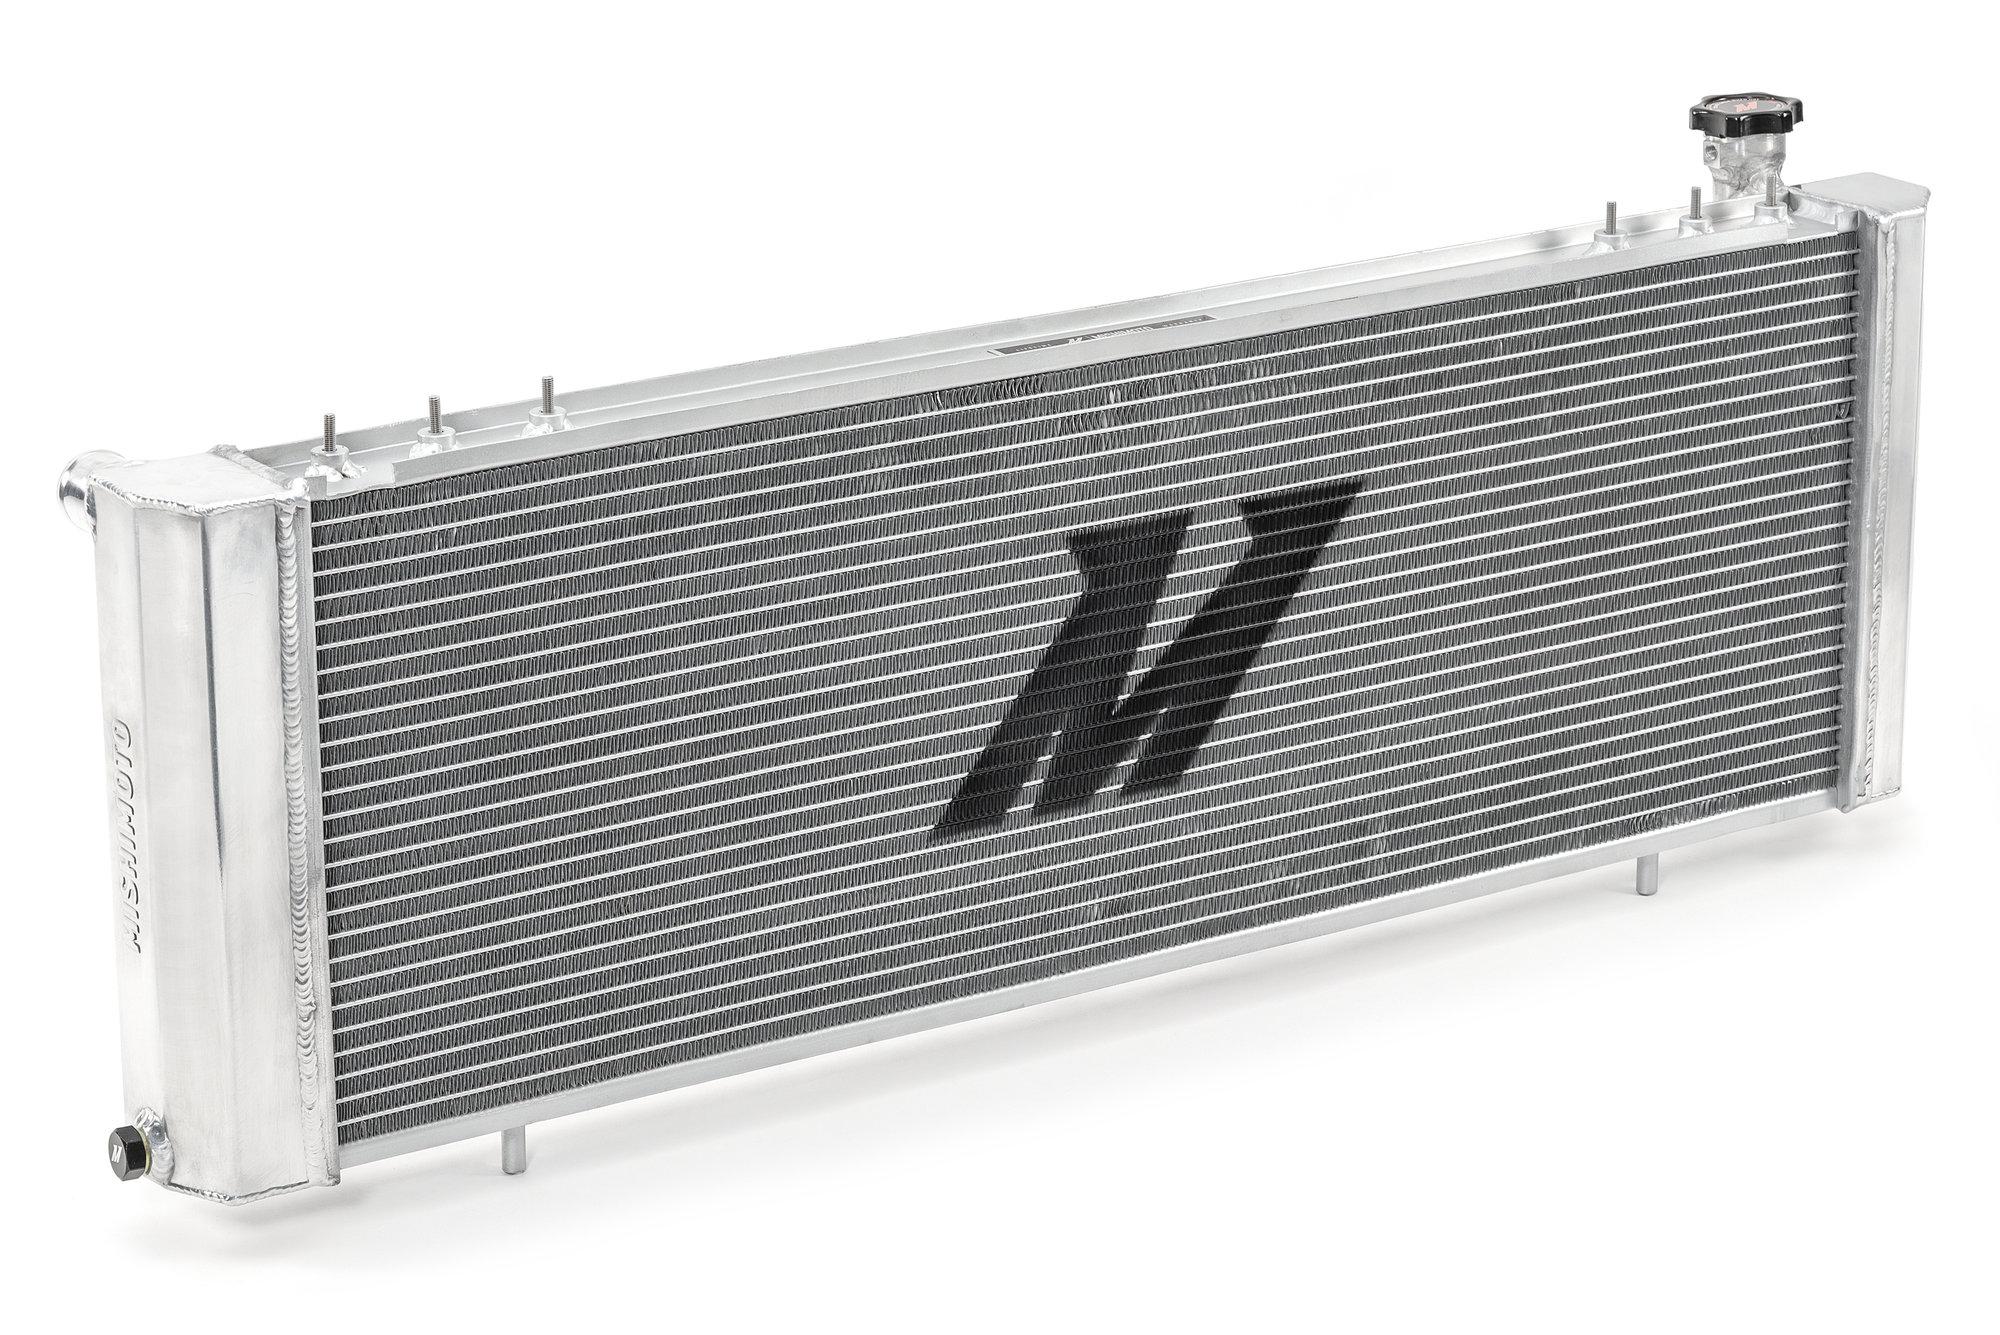 hight resolution of mishimoto mmrad xj 89 performance aluminum radiator for 89 01 jeep cherokee xj with 4 0l engine quadratec